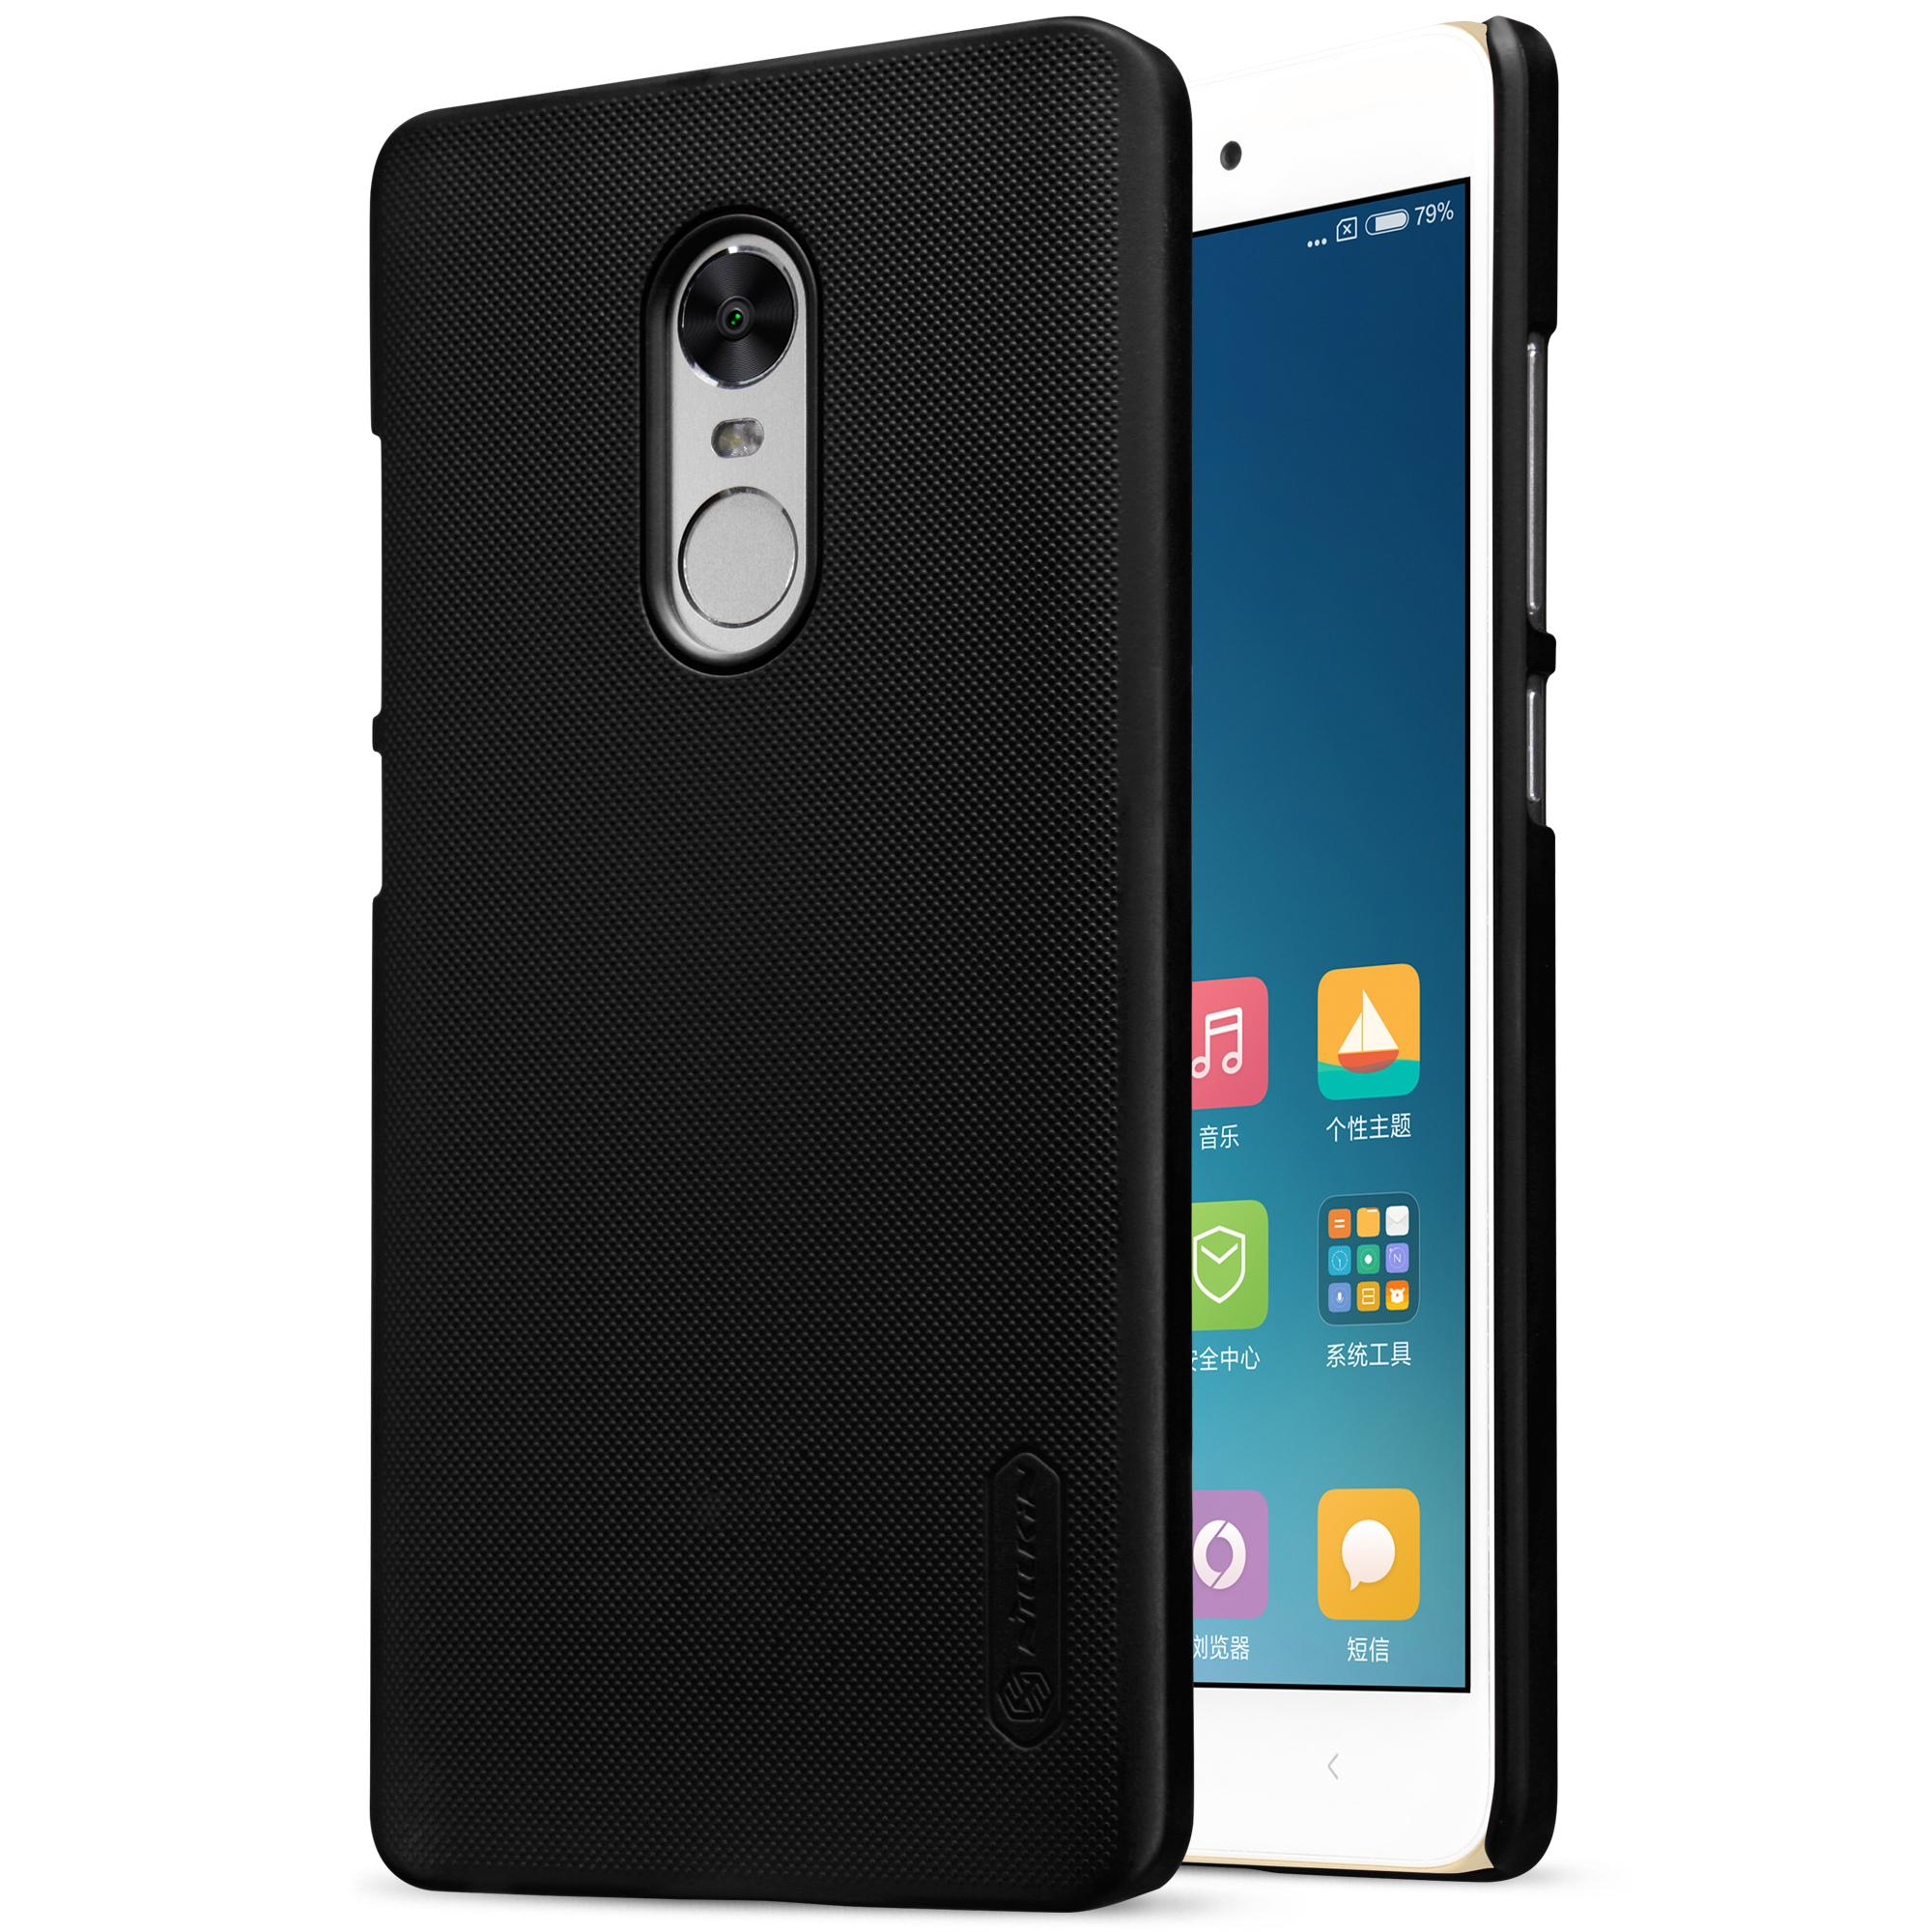 Xiaomi Redmi Note 4x Hulle Redmi Note 4 Hulle Nillkin Super Frosted Shield Hulle Fur Redmi 4pro Free Hd Film